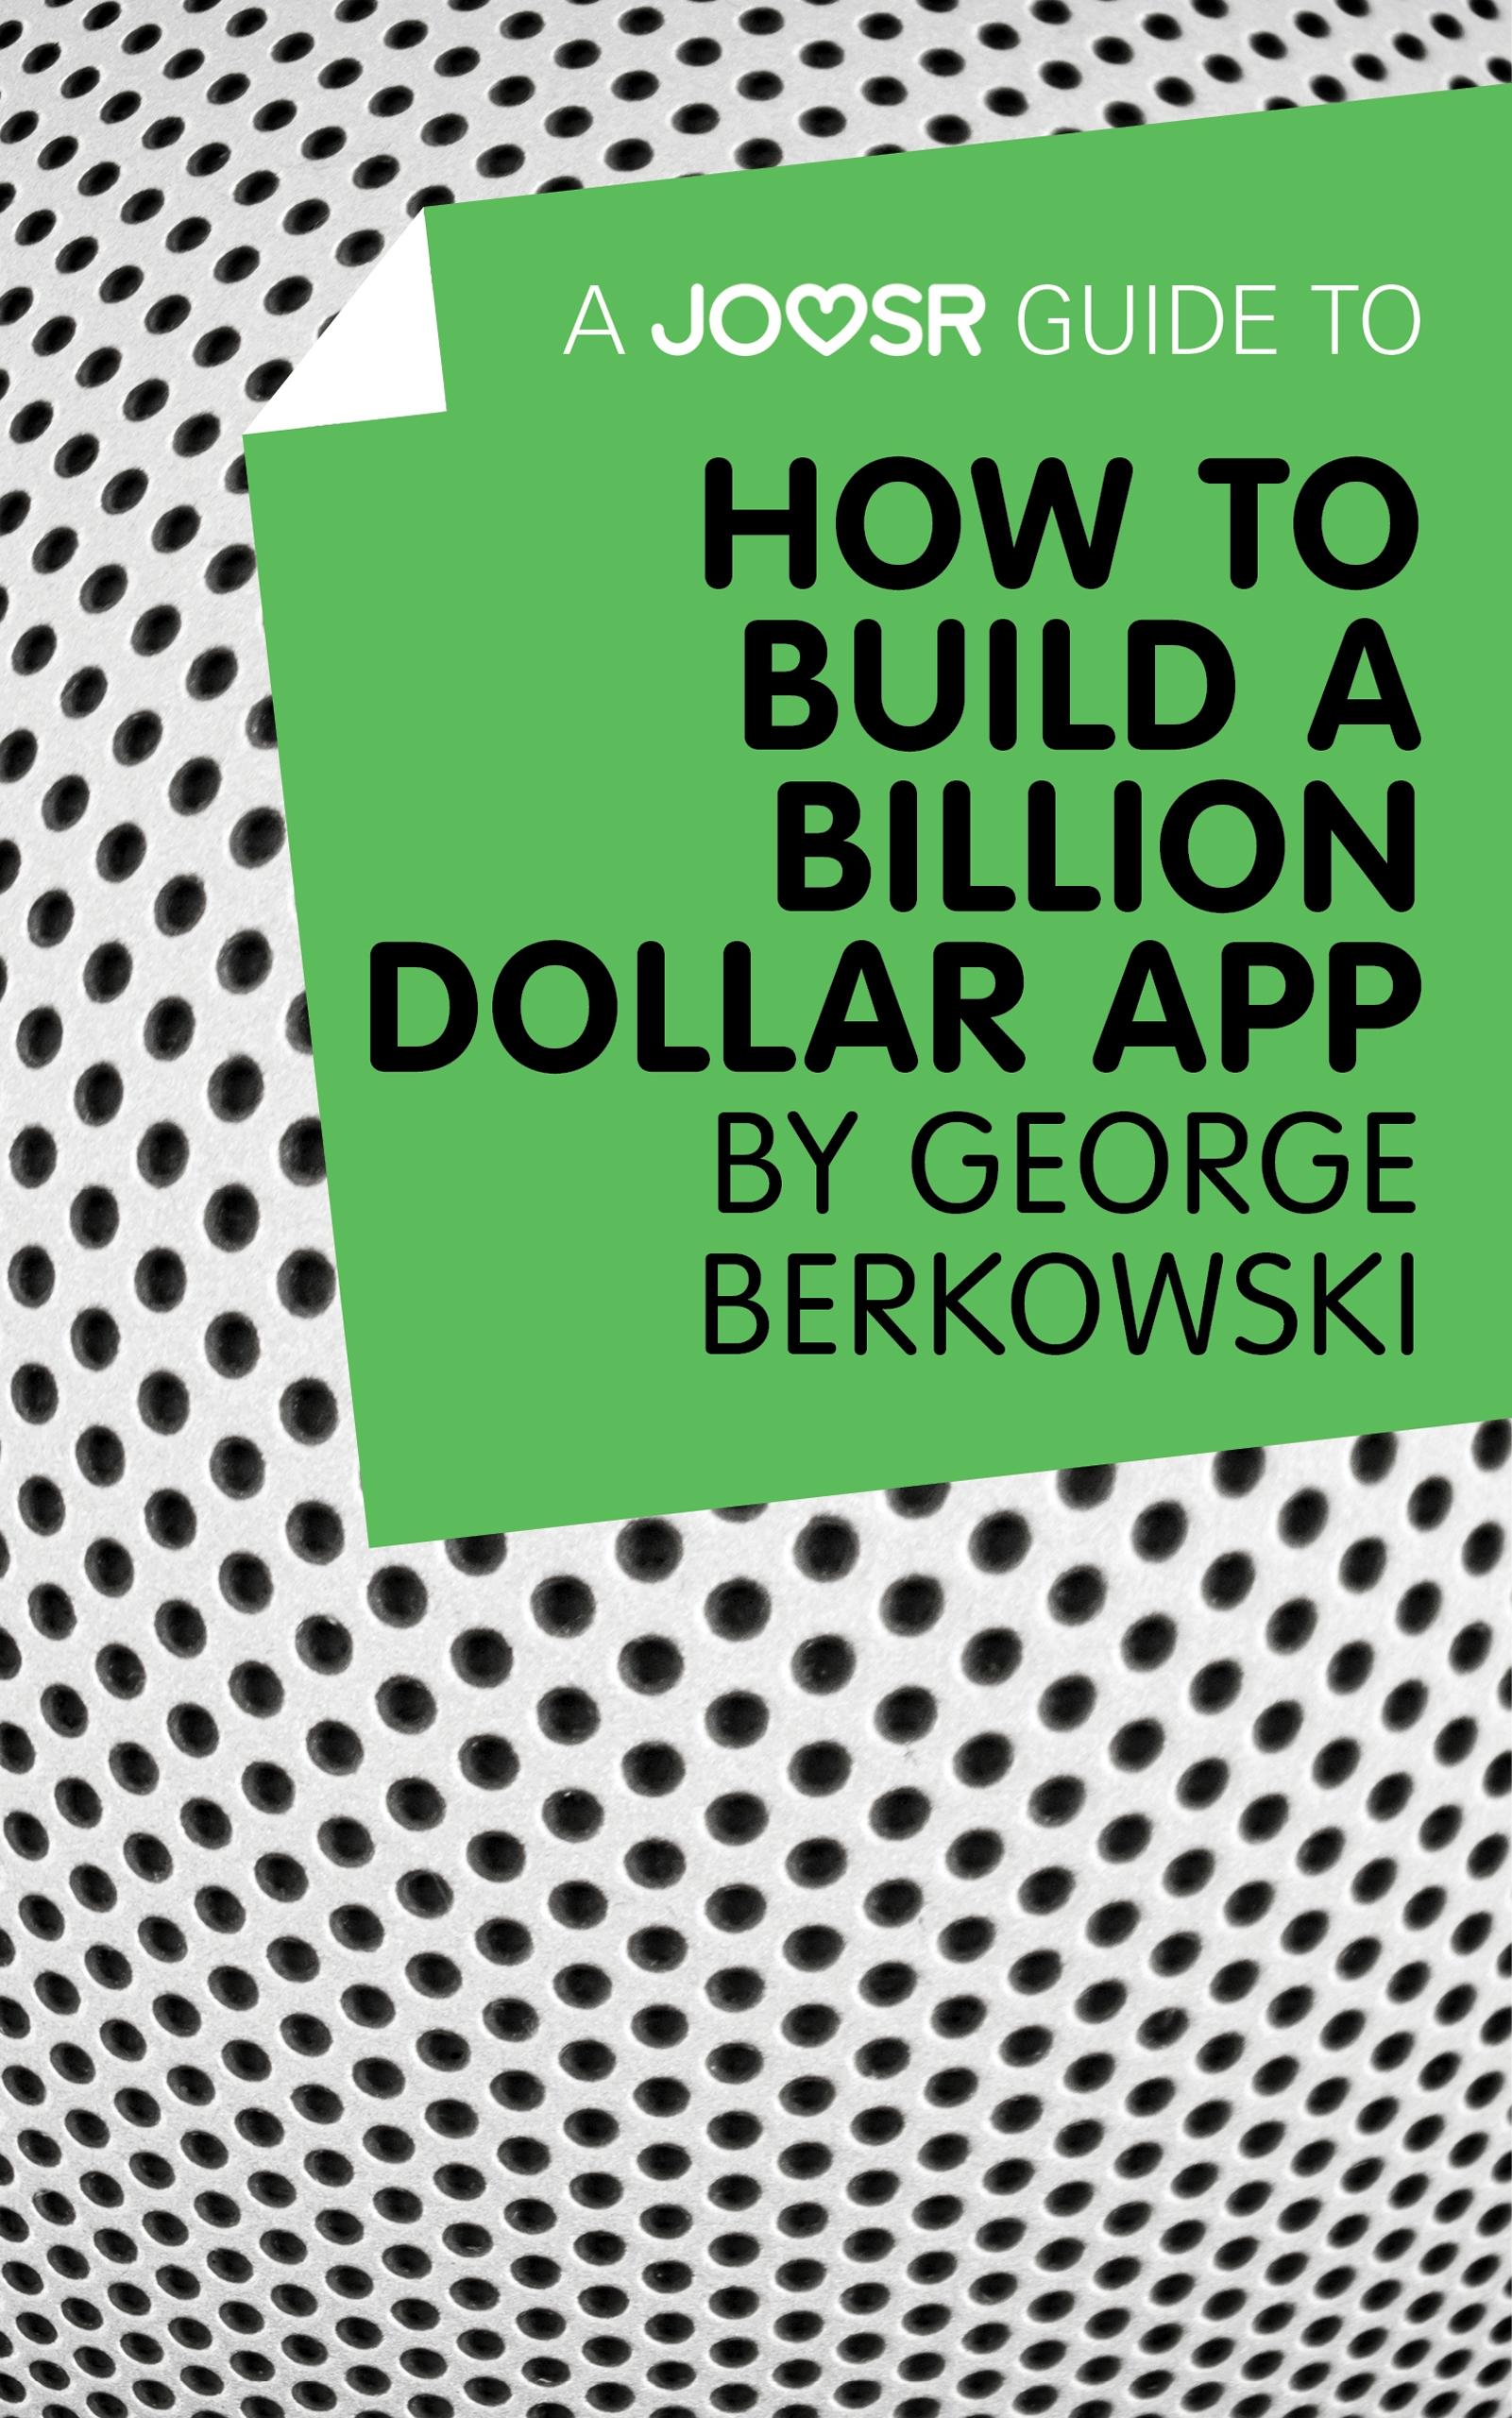 Download Ebook A Joosr Guide to... How to Build a Billion Dollar App by George Berkowski by Joosr Pdf